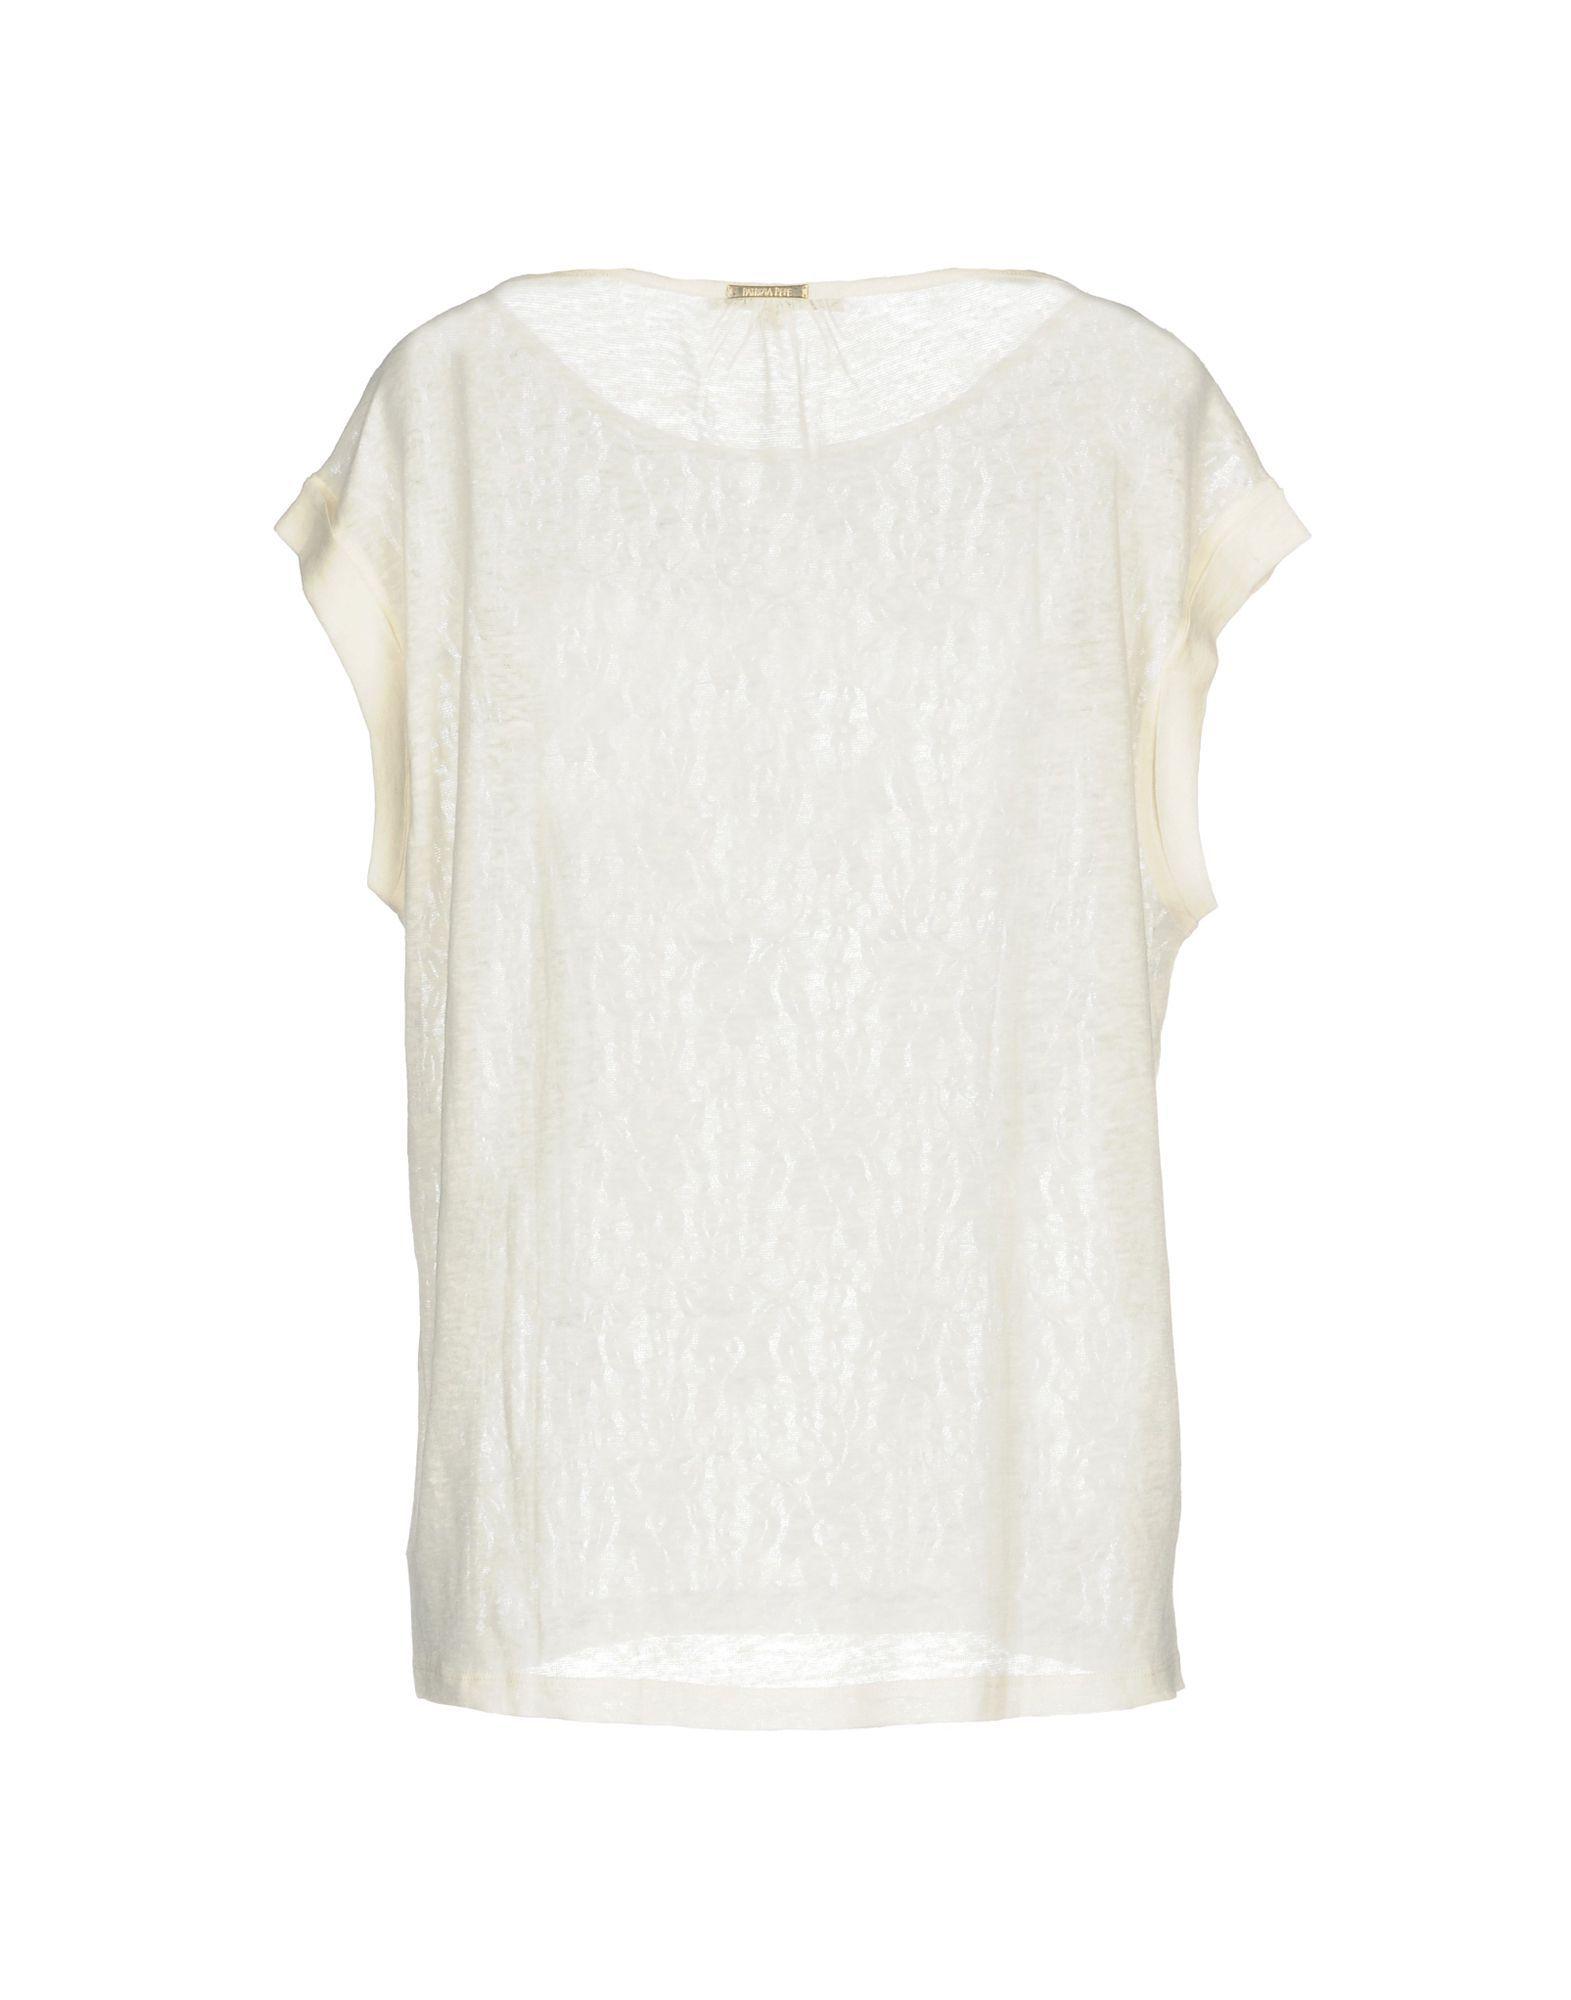 Patrizia Pepe White Stripe Short Sleeve Knit